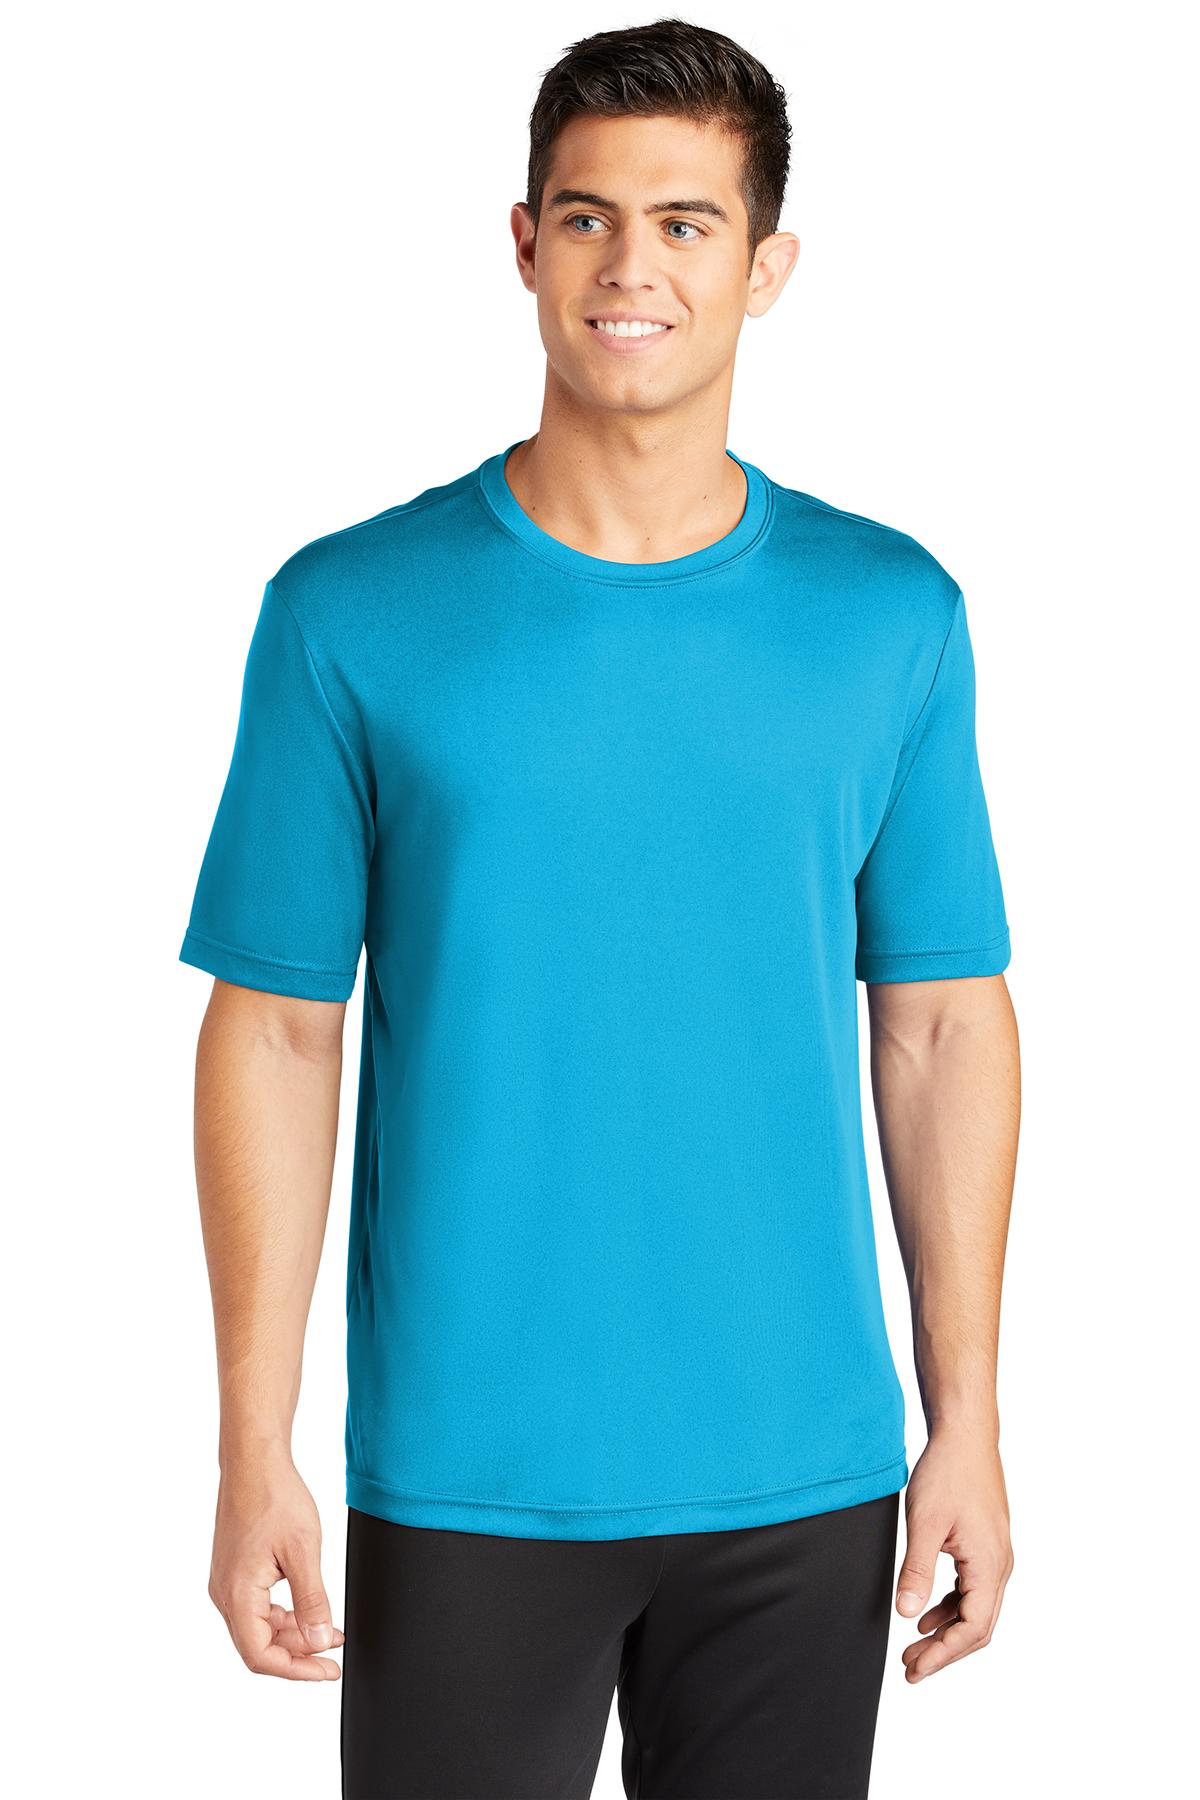 Custom Made T-Shirts!